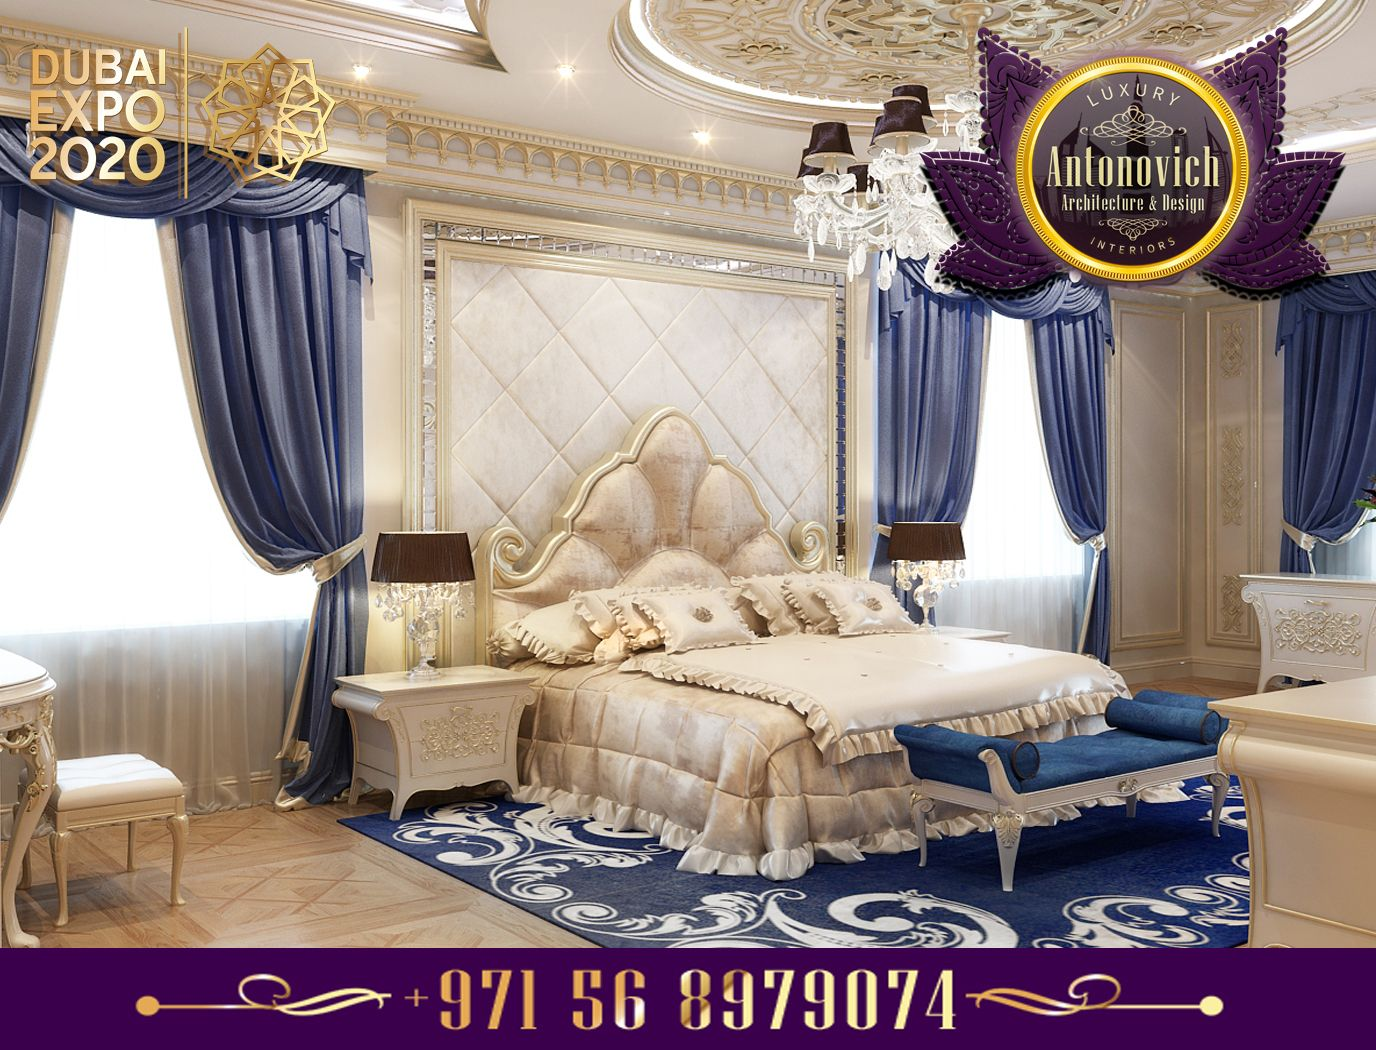 Best Pin By Luxury Antonovich Design On Gorgeous Bedrooms From Antonovich Design Master Bedroom 400 x 300